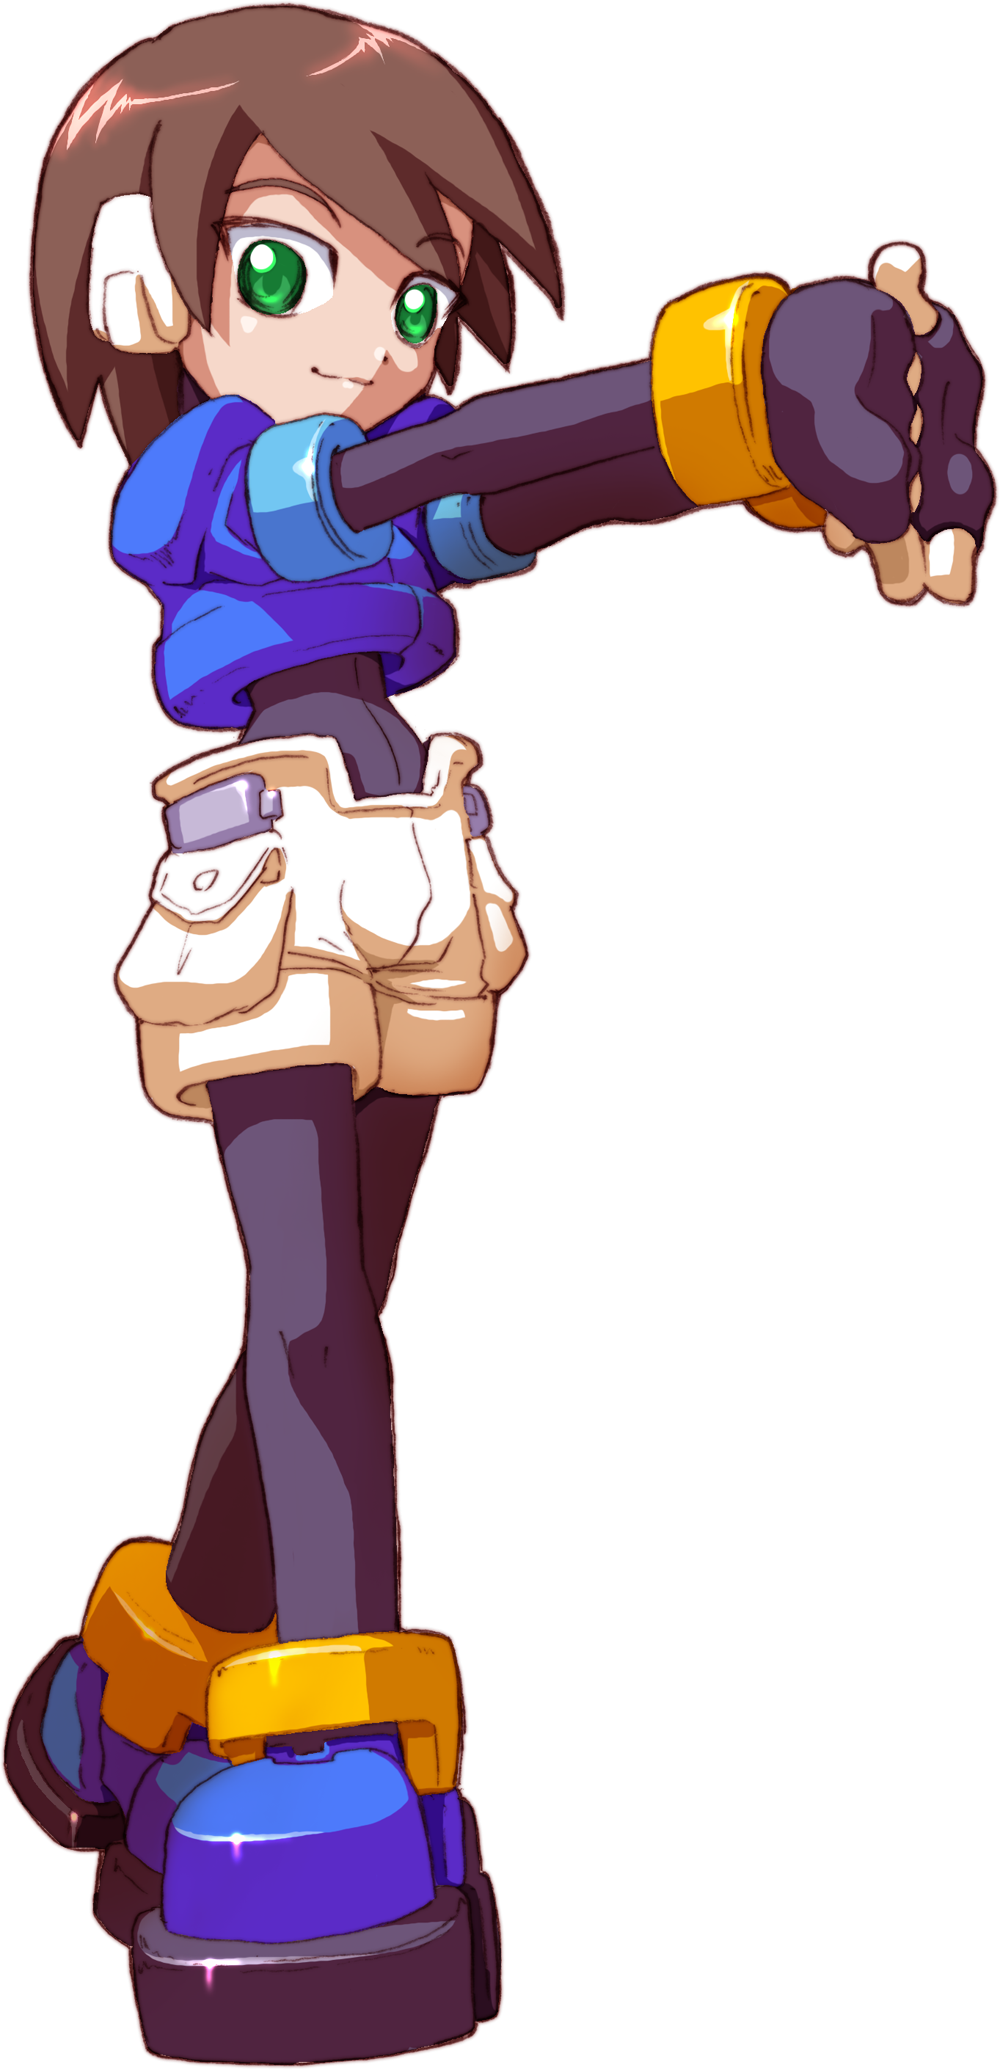 Mega man zx video game mmkb the mega man knowledge - Megaman wikia ...